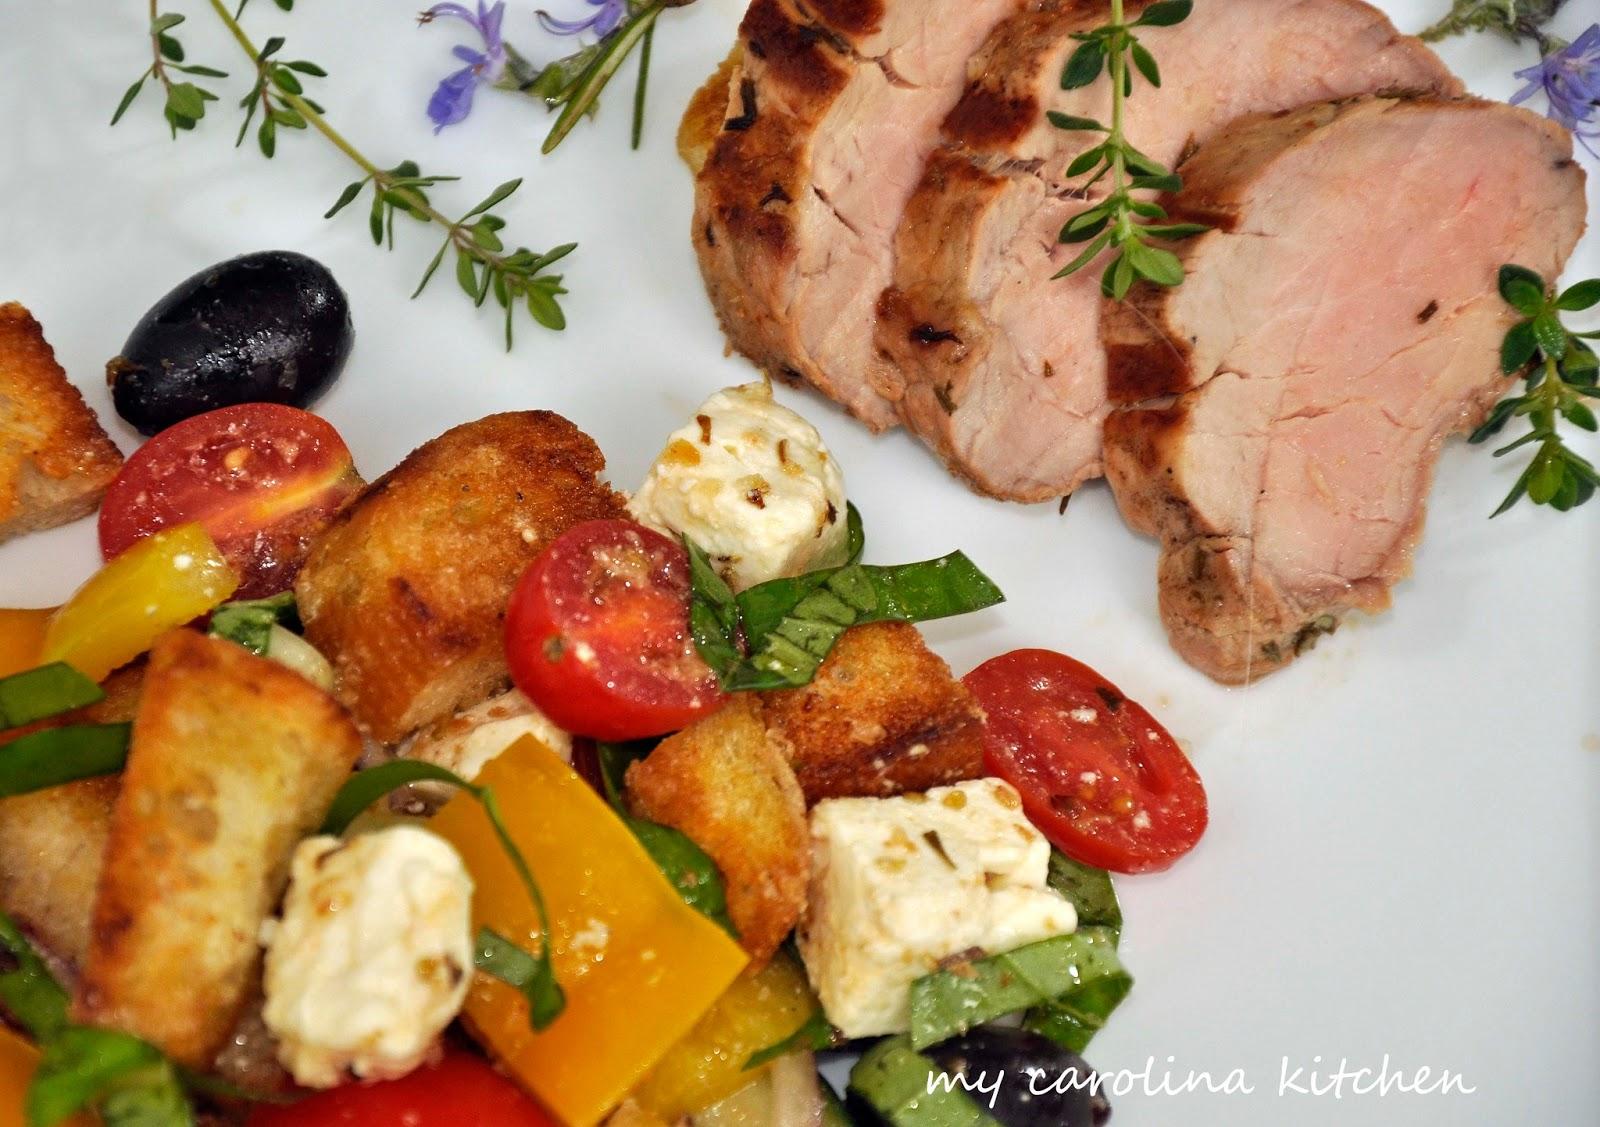 My Carolina Kitchen Herb Marinated Pork Tenderloin With A